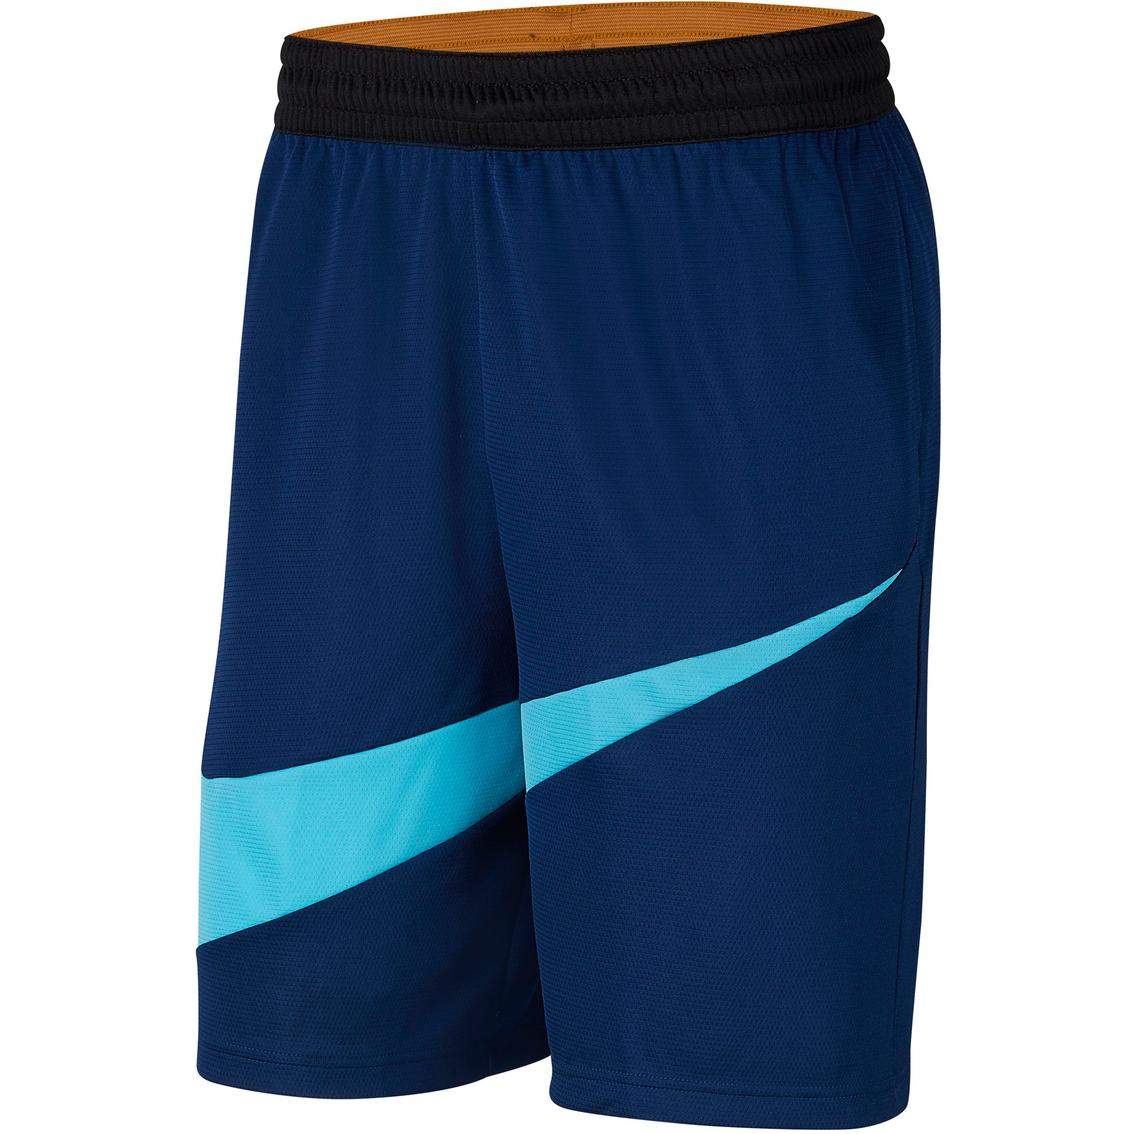 Nike Hbr 2.0 Basketball Shorts | Shorts